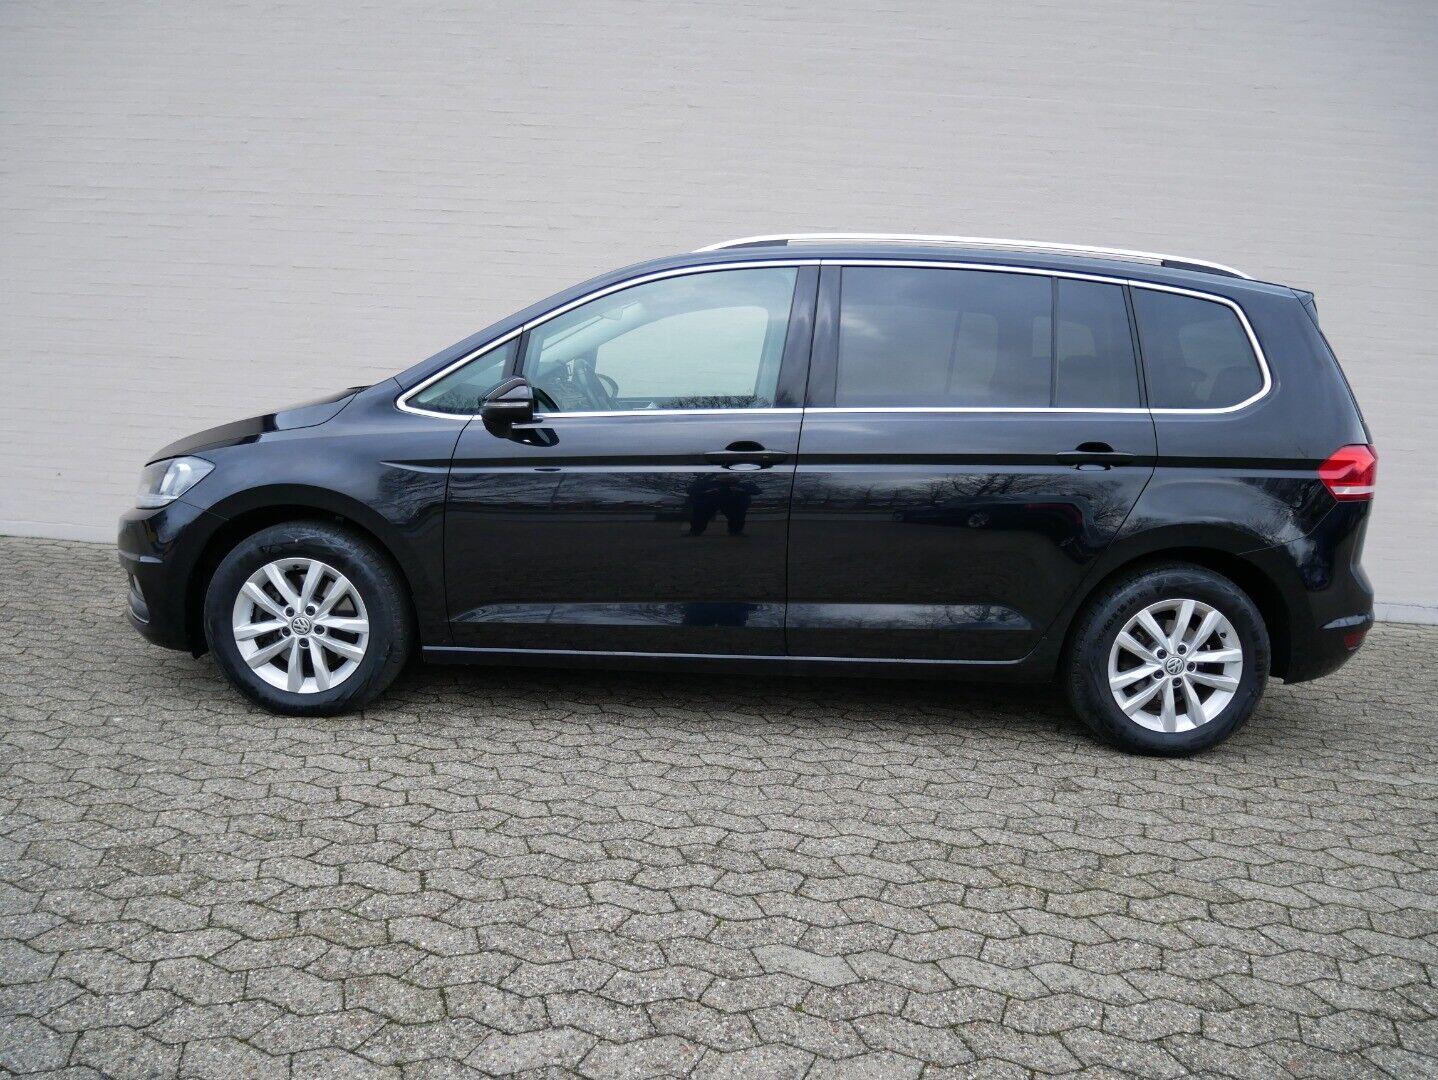 VW Touran 1,6 TDi 115 Highline DSG 7prs 5d